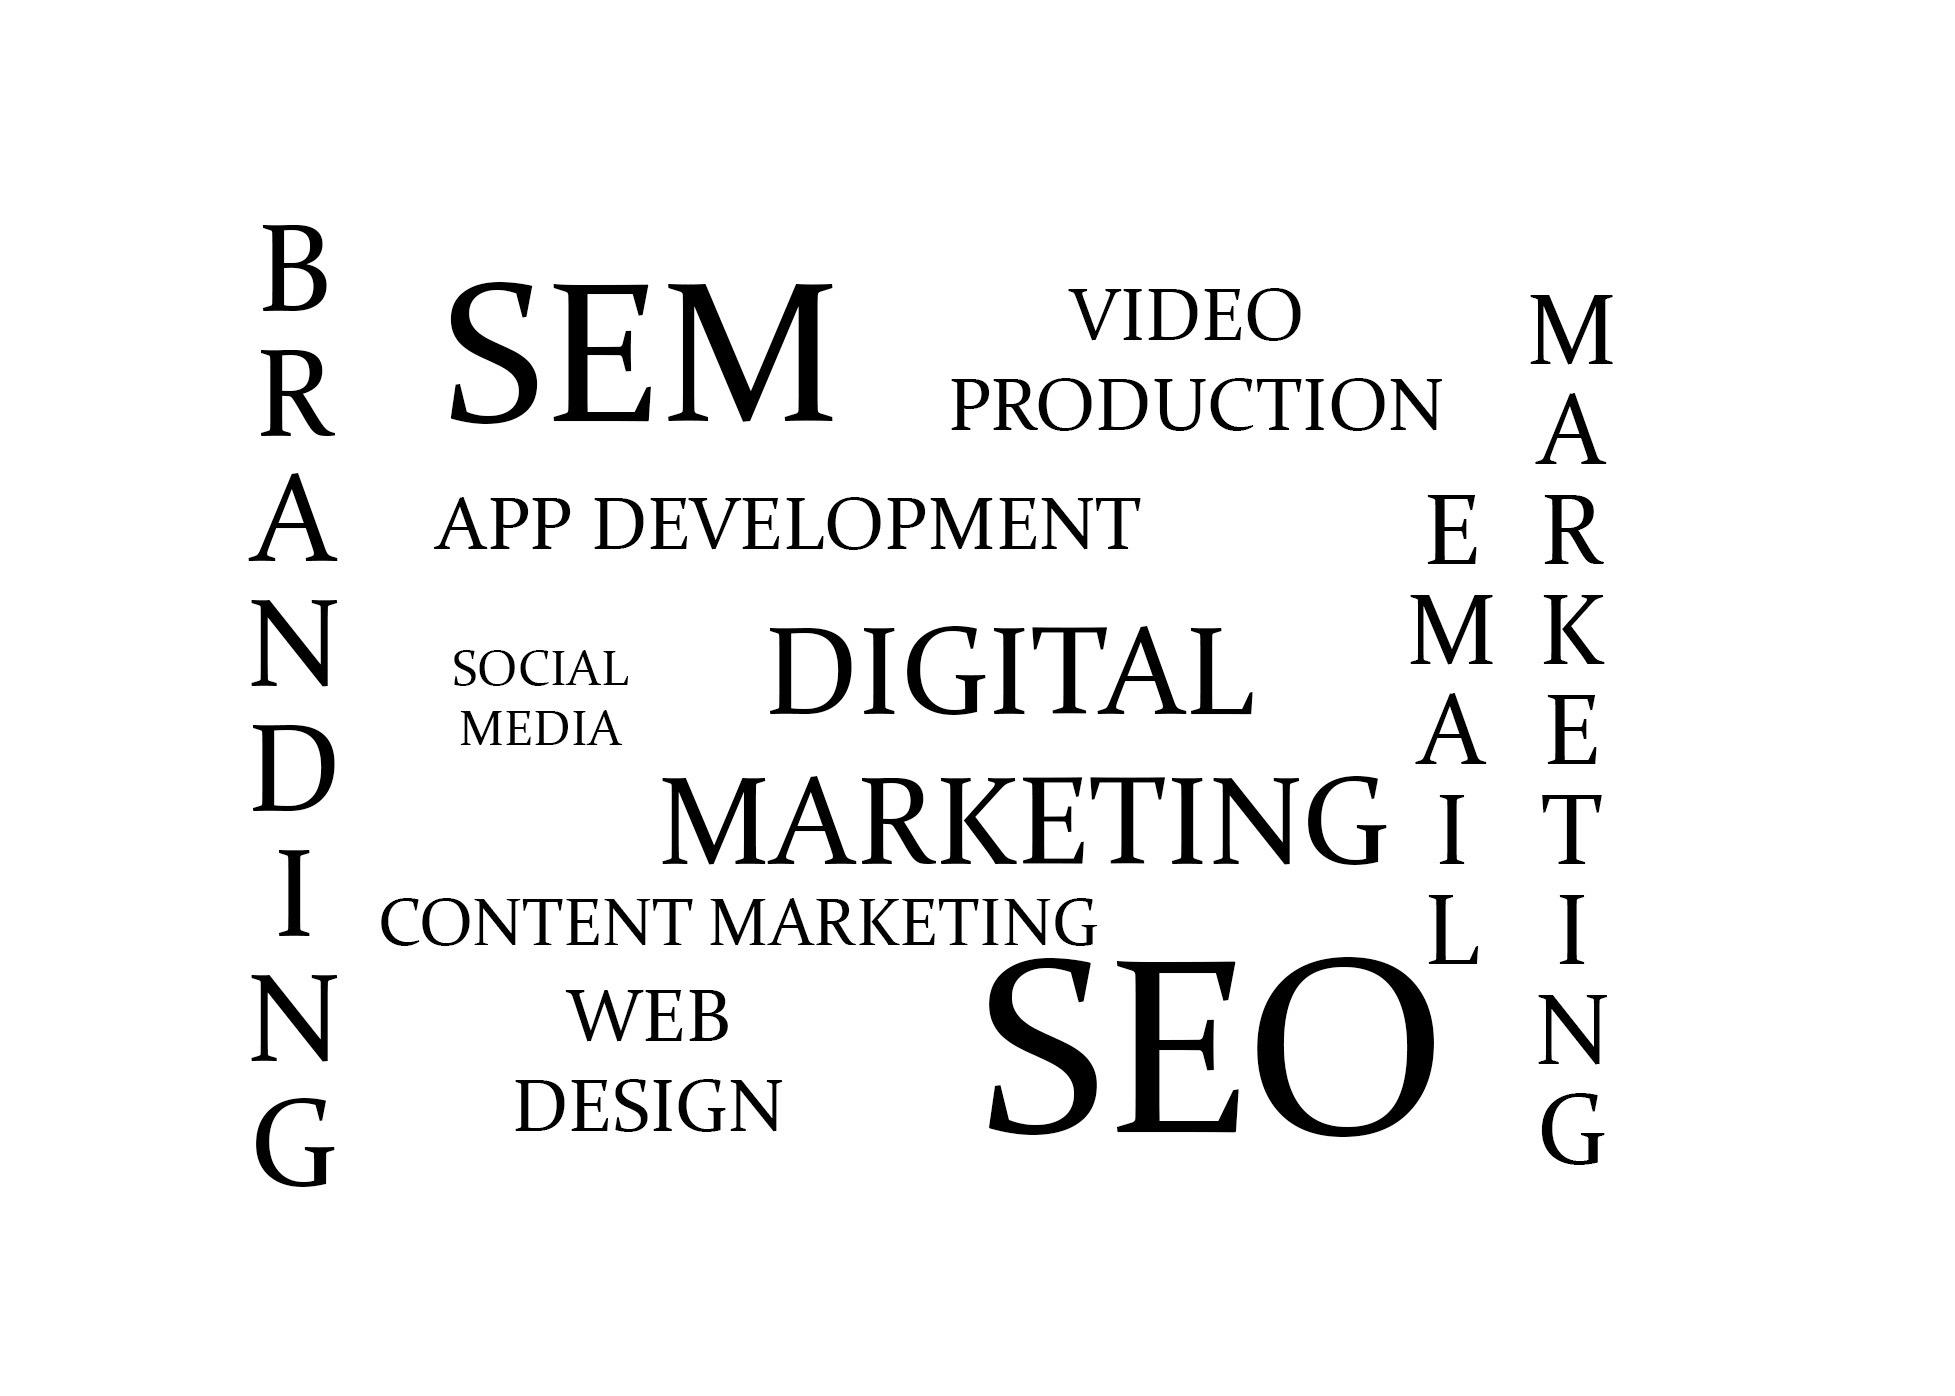 seo-branding-sem-social-media-content-marketing-web-design-email-marketing-video-production_t20_E0dp2Z